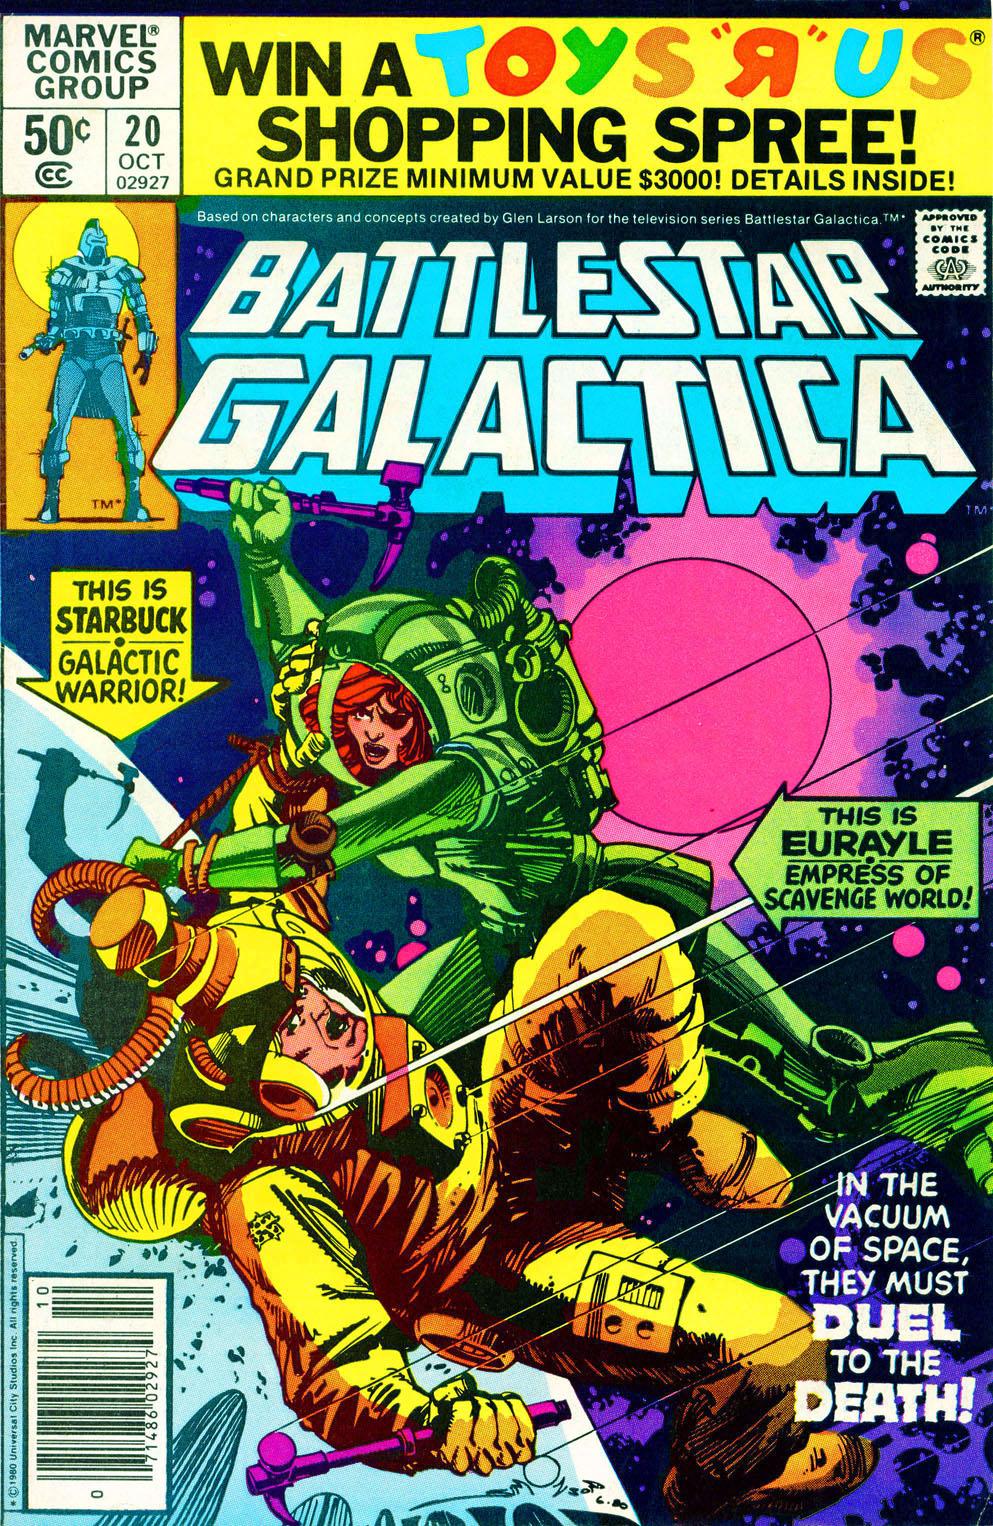 Battlestar Galactica 20 Page 1